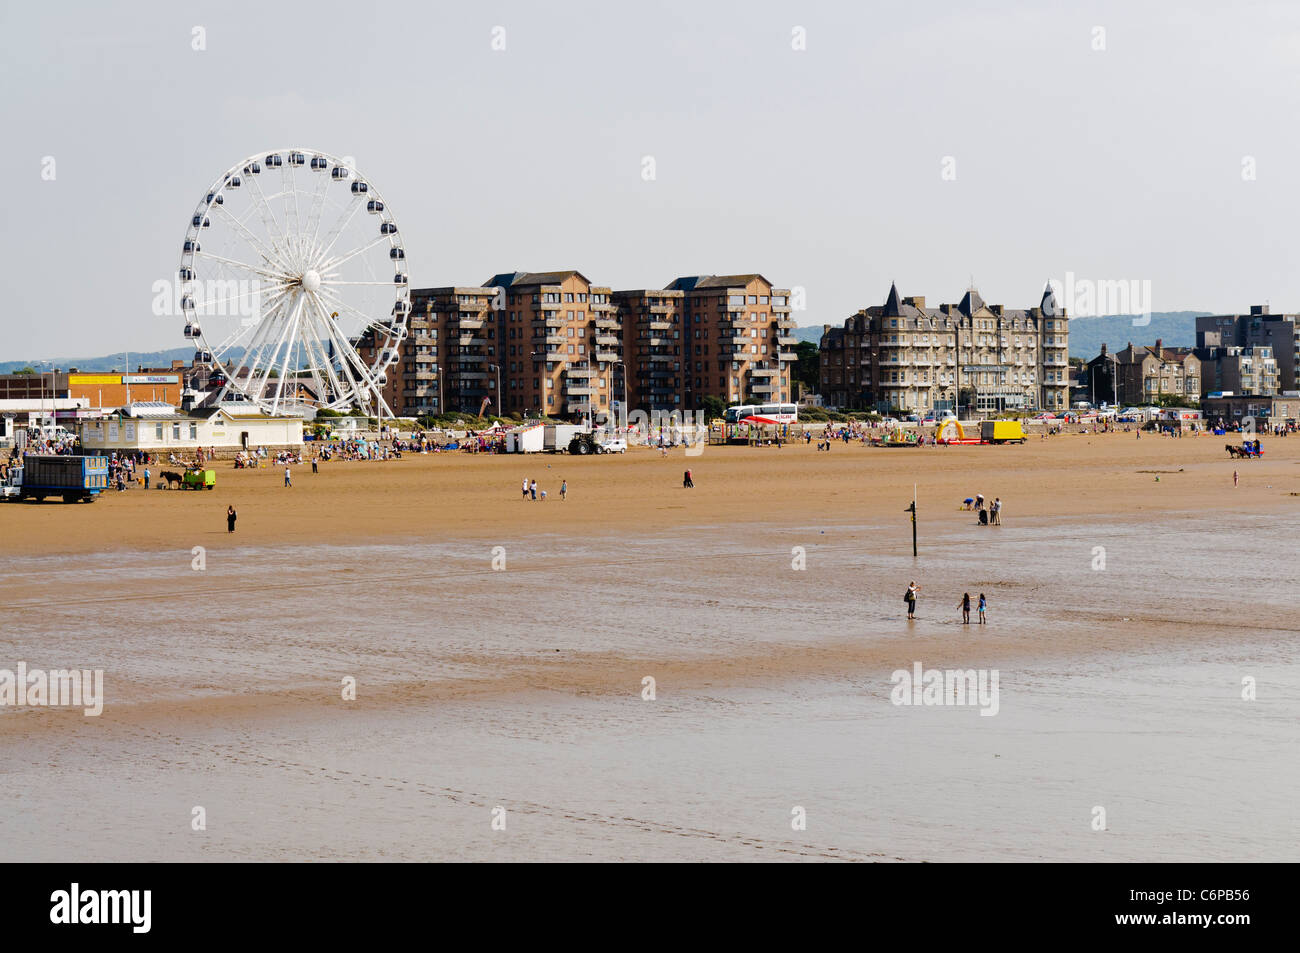 Large ferris wheel beside the beach in Weston Super Mare - Stock Image